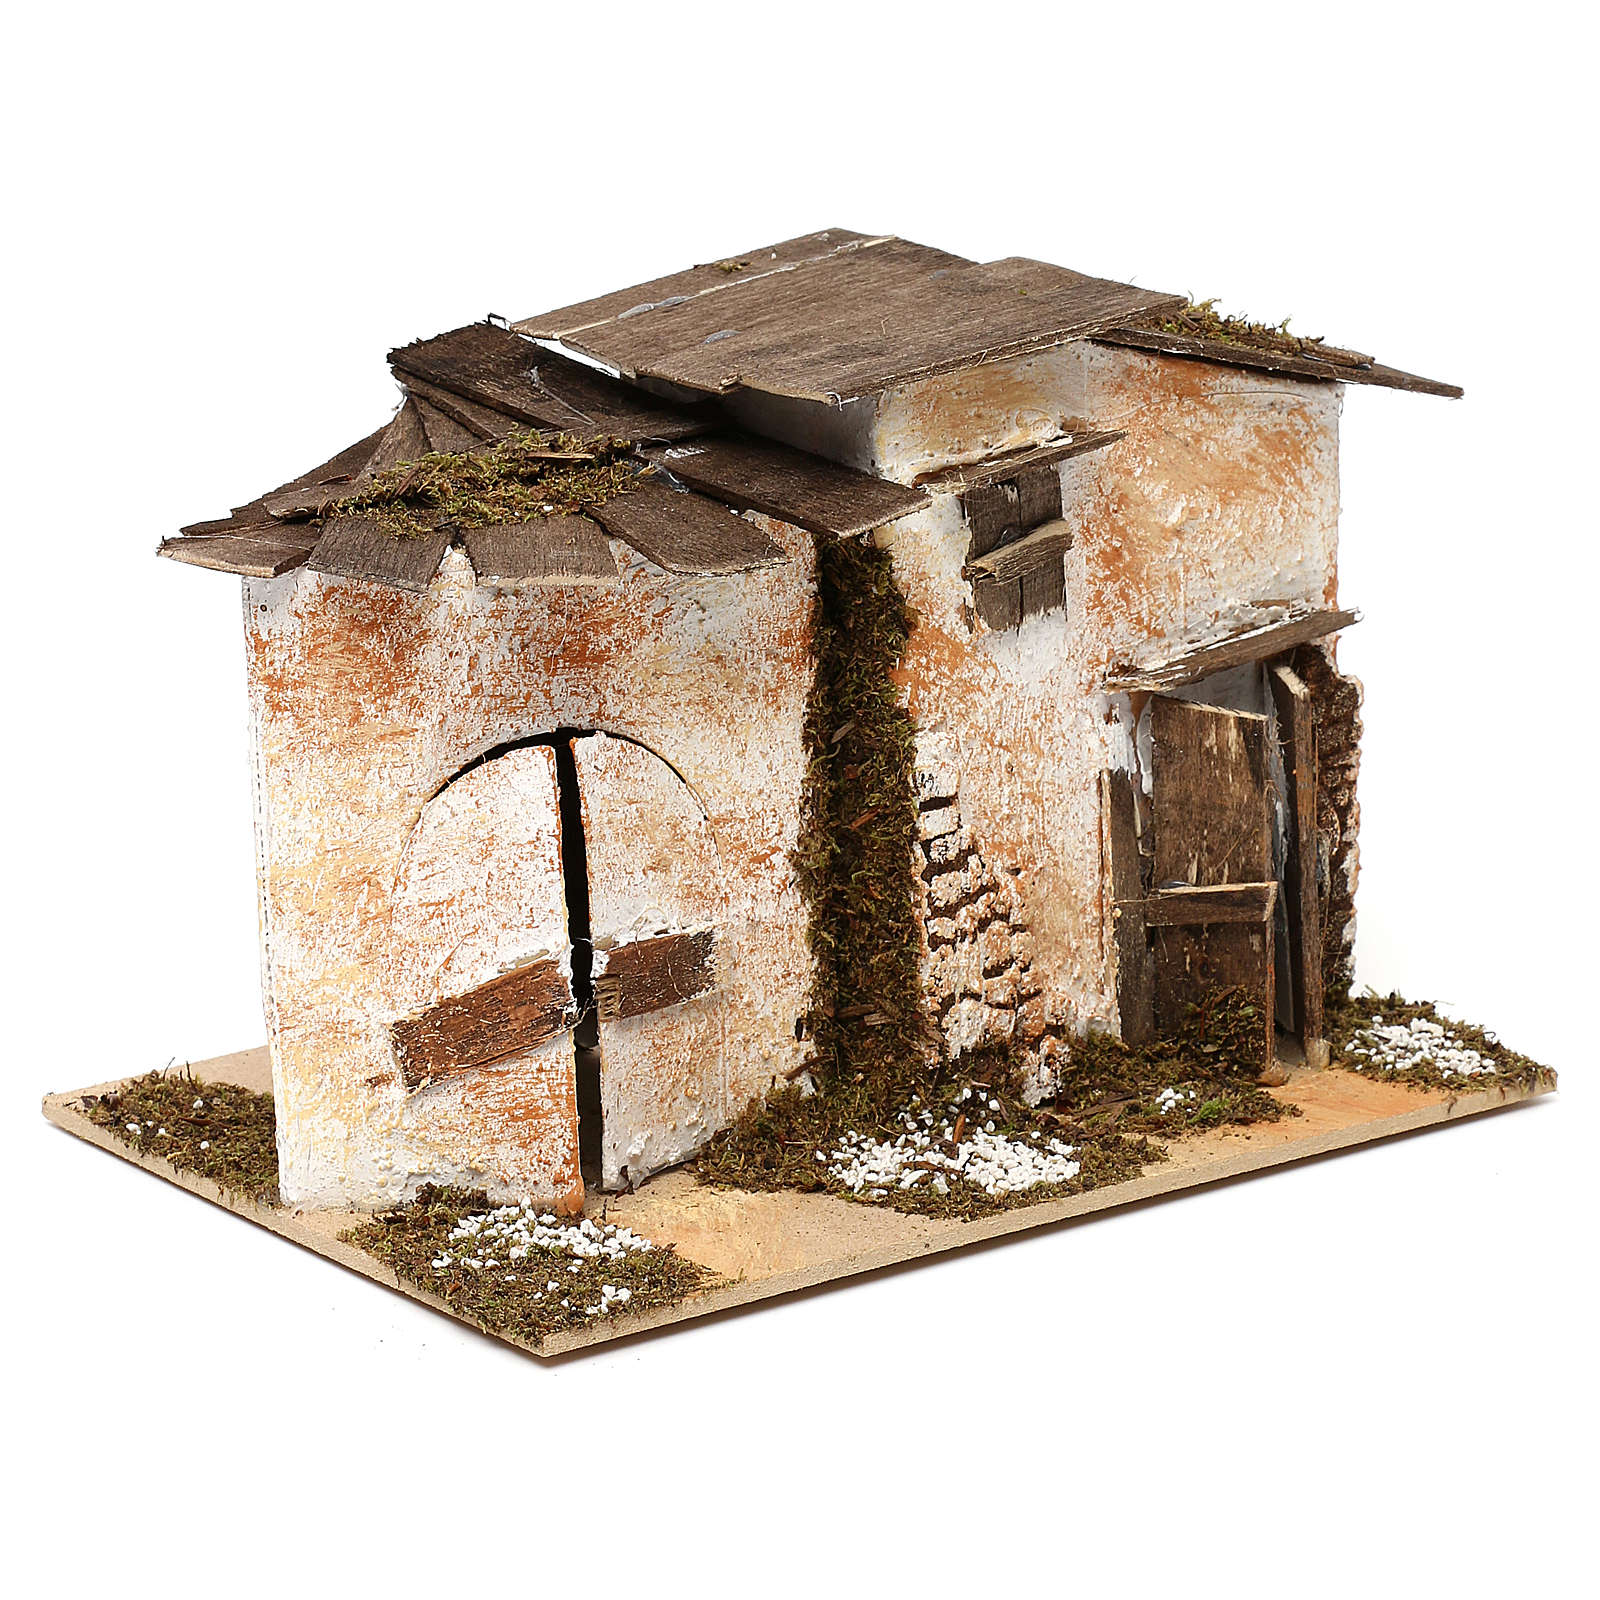 Casetta in stile rustico con 2 ingressi 15x20x15 per presepi di 7 cm 4